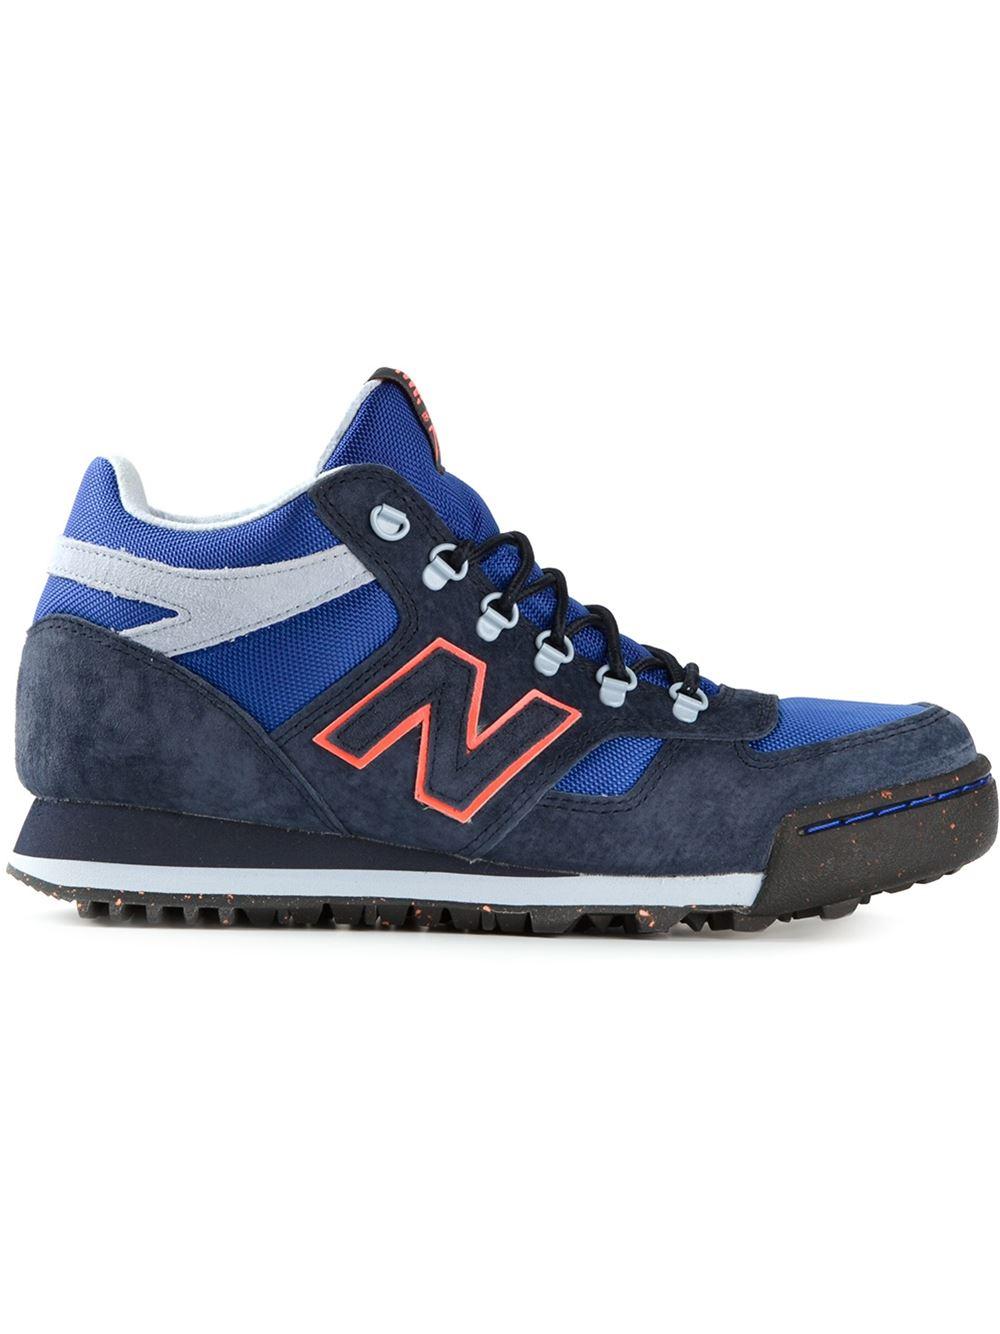 lyst new balance 39 h710 39 hi top sneakers in blue for men. Black Bedroom Furniture Sets. Home Design Ideas